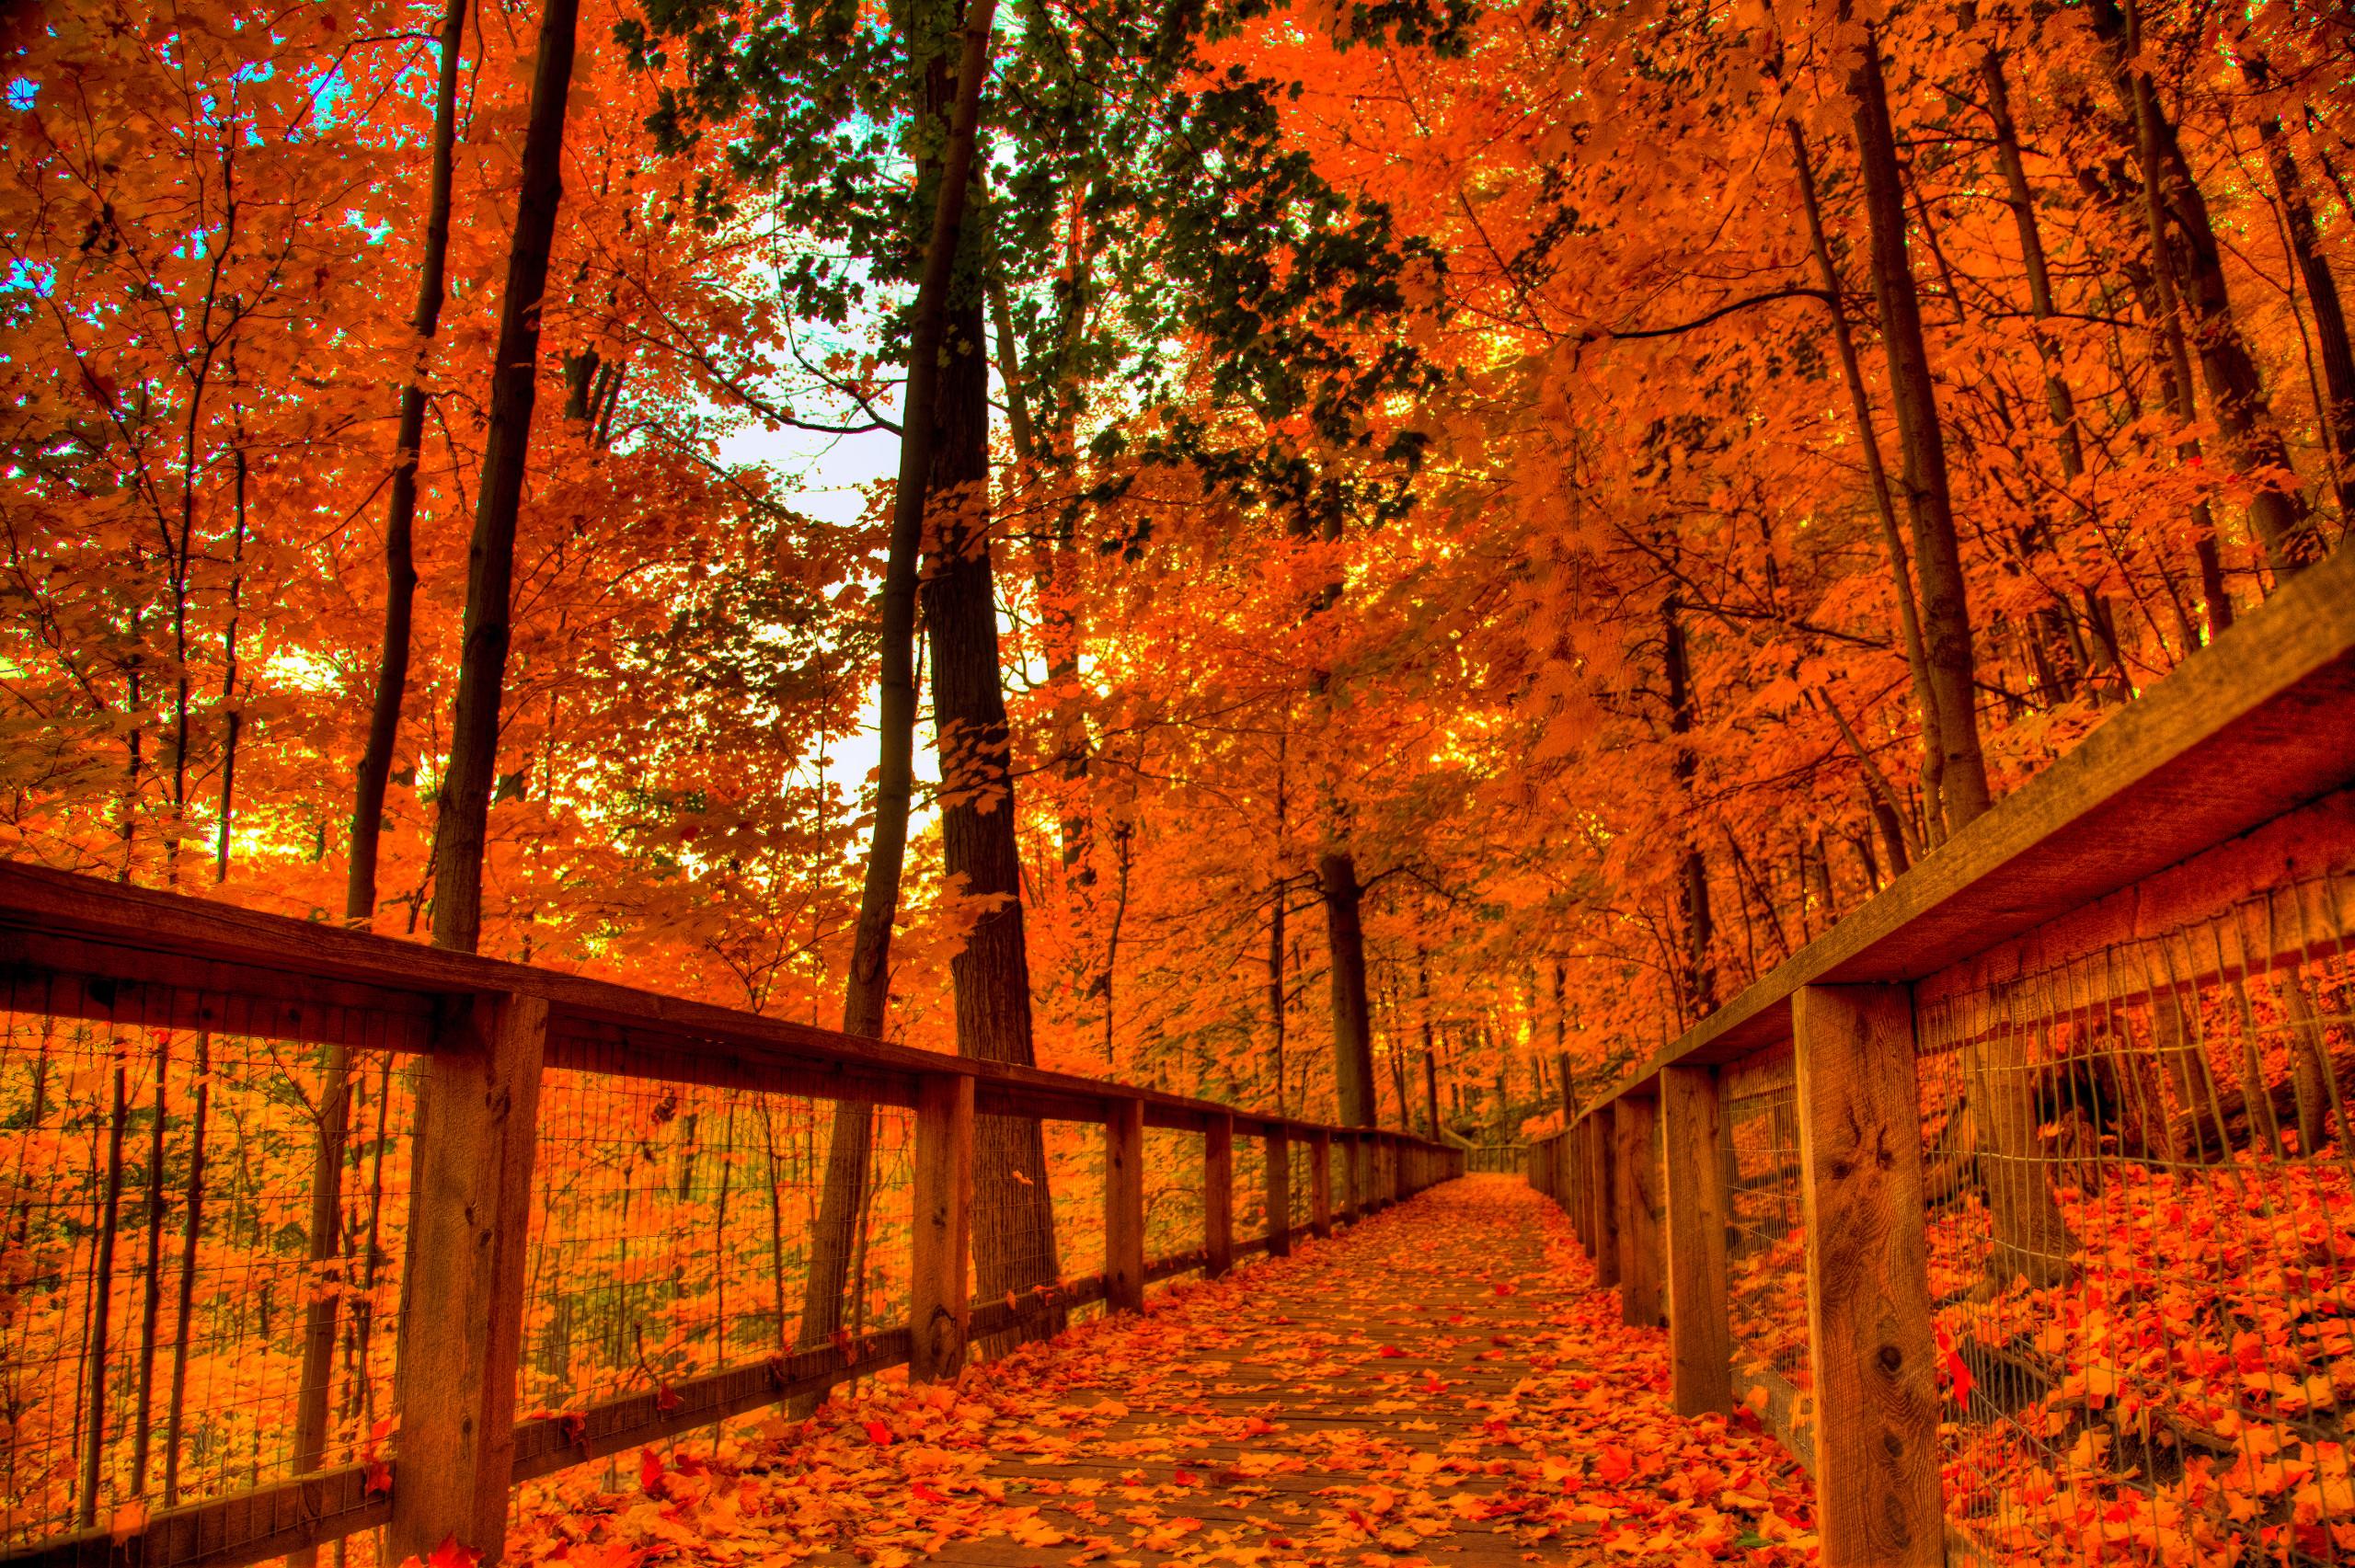 fall themed desktop backgrounds